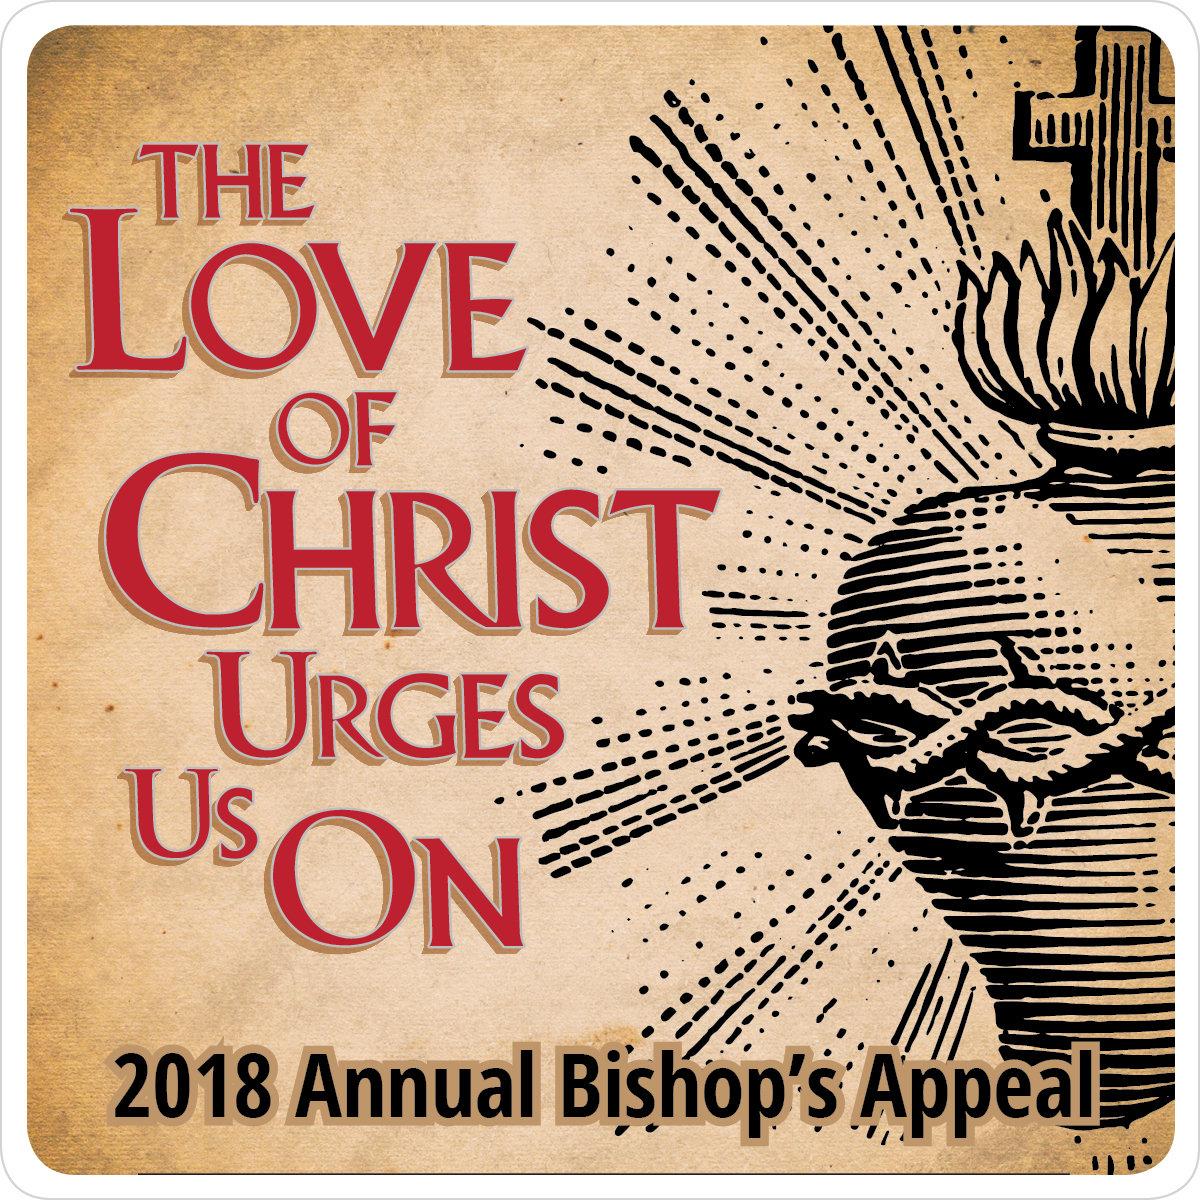 baa bishops annual appeal - HD1200×1200